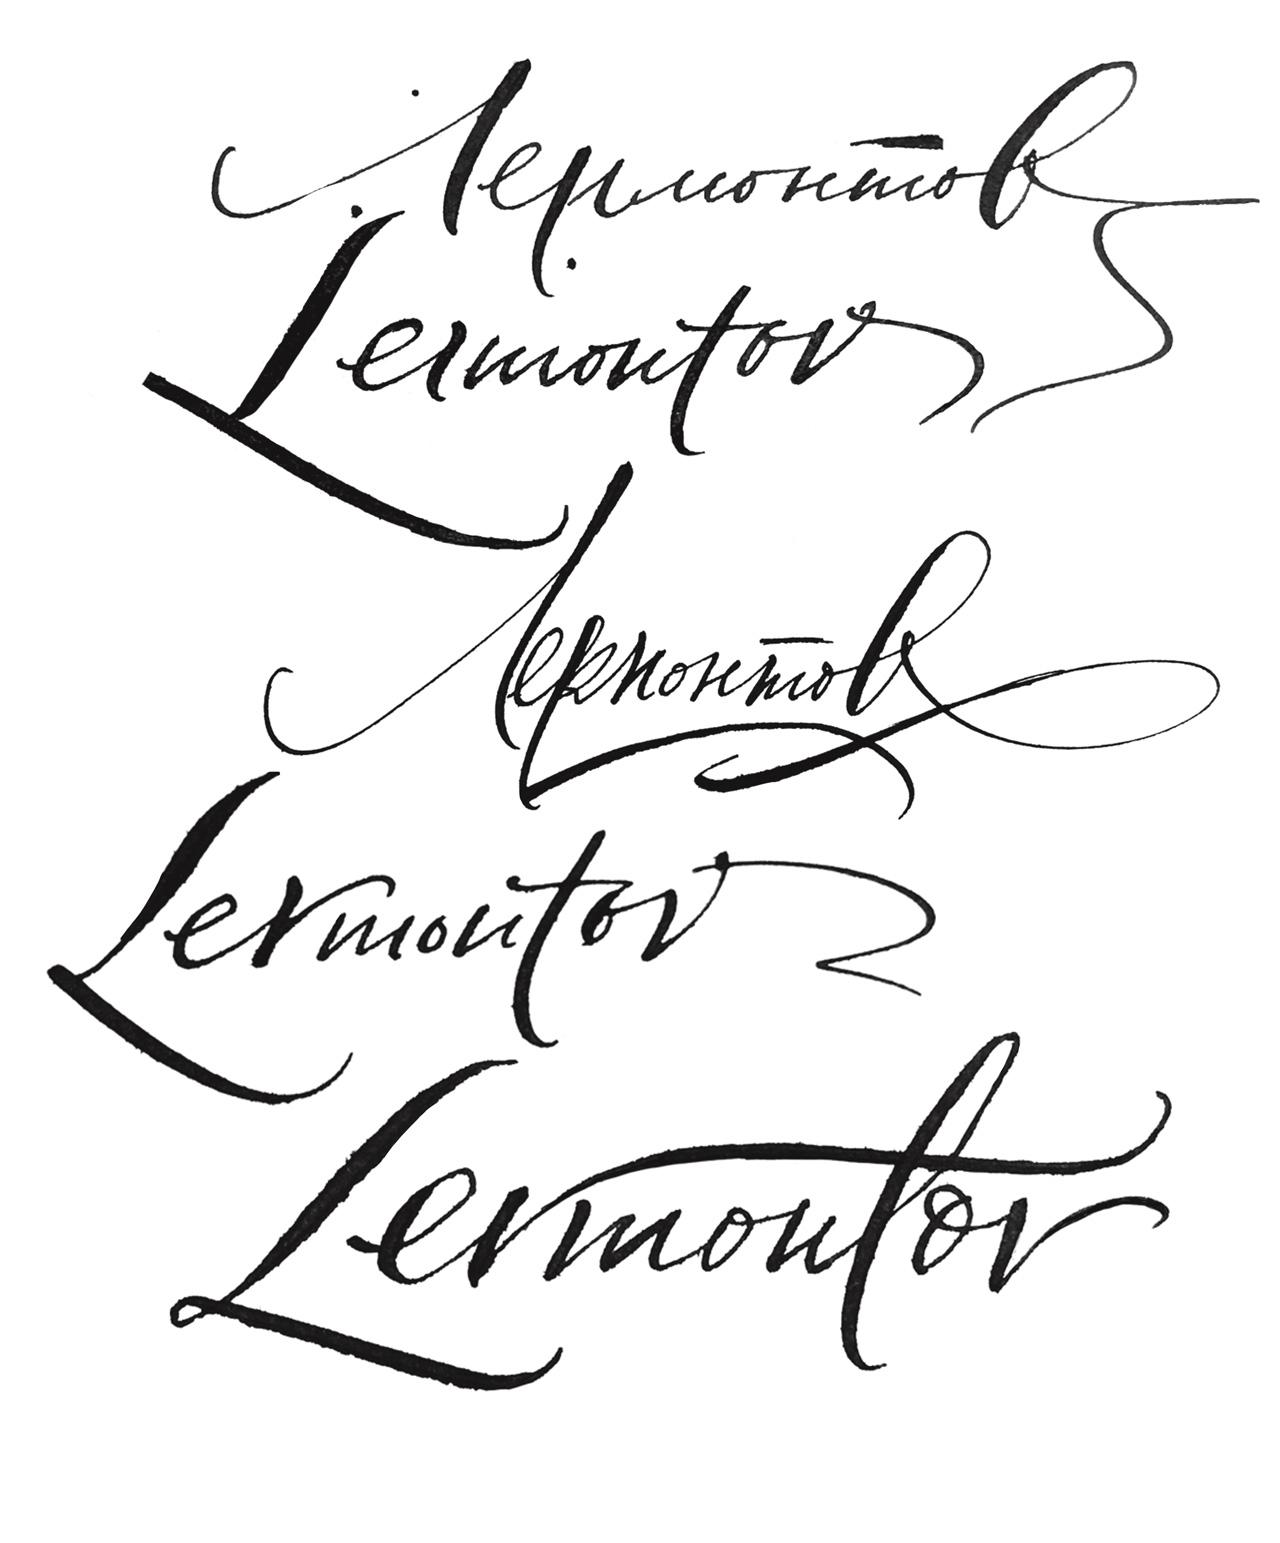 Lermontov_title_3